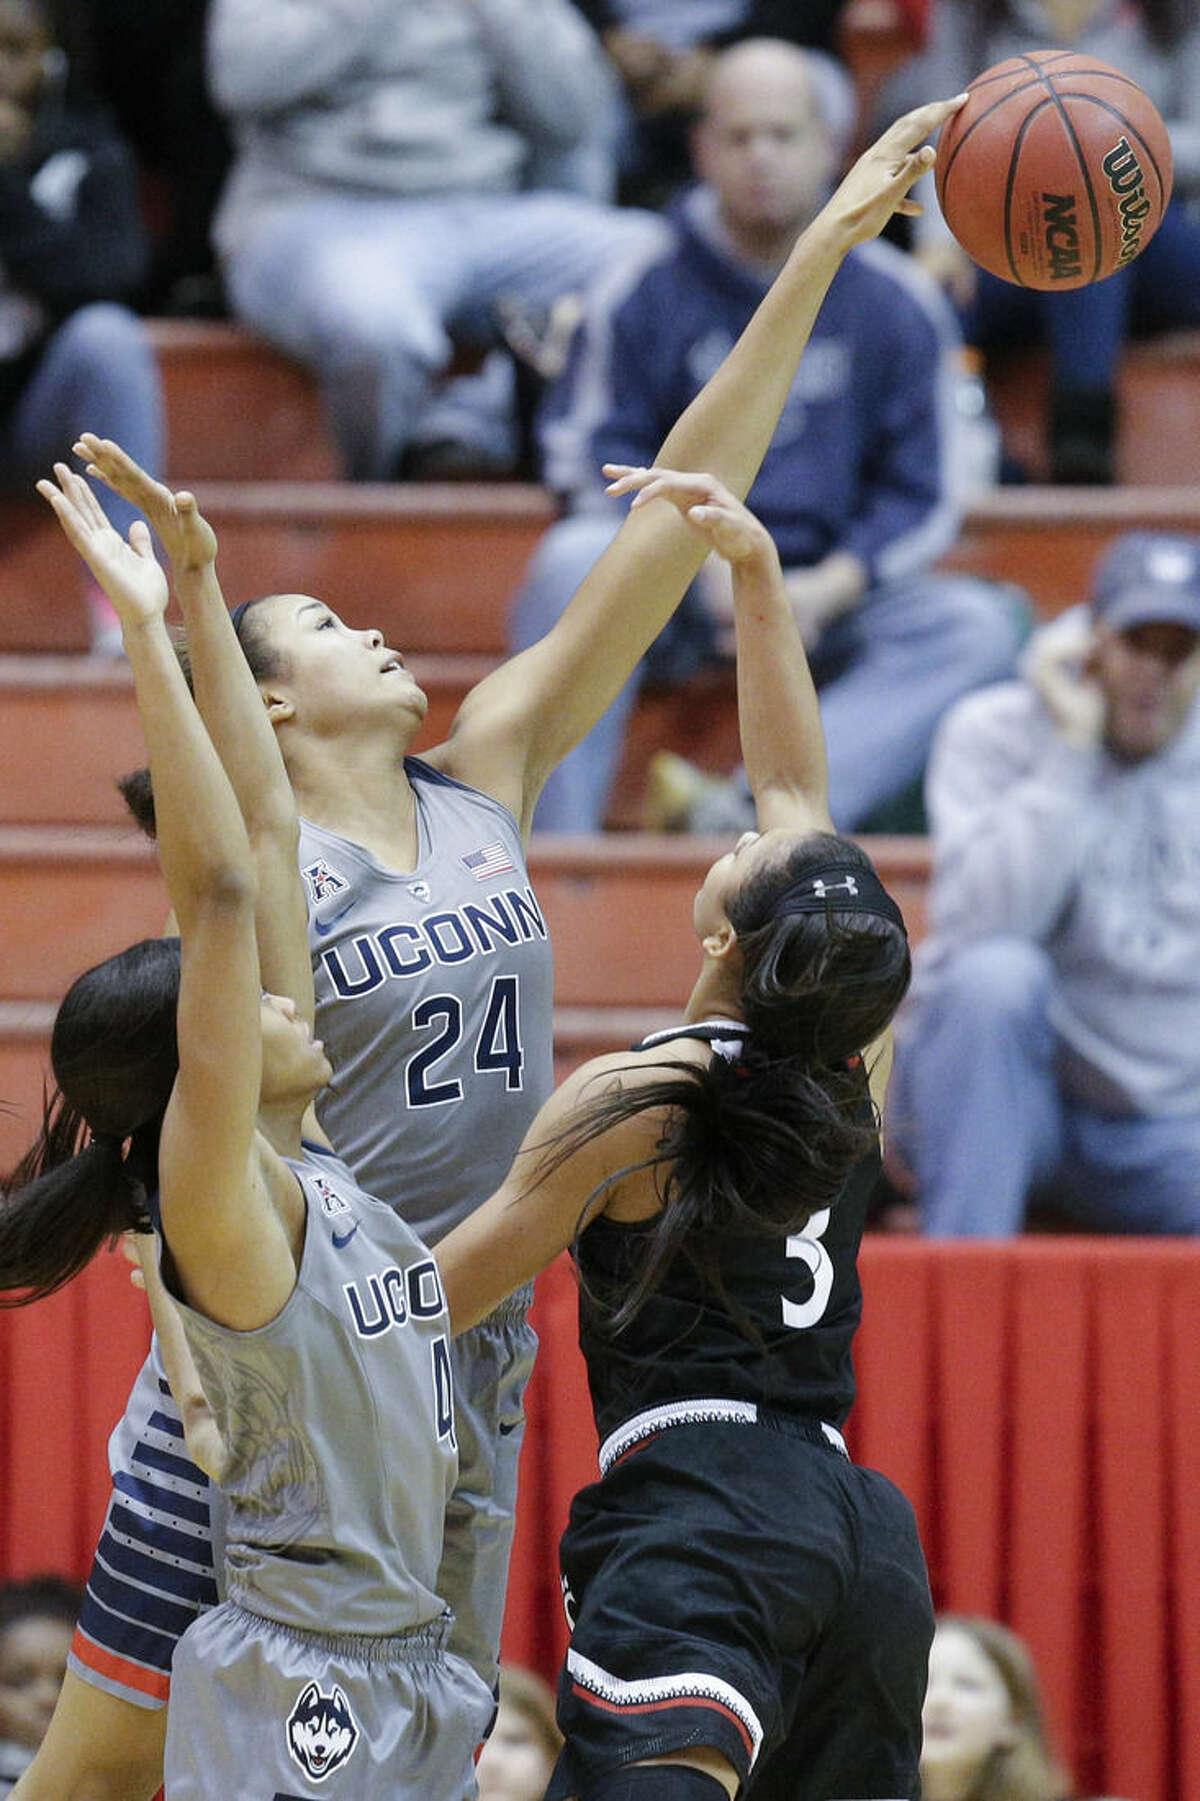 Connecticut's Napheesa Collier (24) blocks a shot by Cincinnati's Ana Owens (3) as Moriah Jefferson (4) defends during the first half of an NCAA college basketball game, Wednesday, Dec. 30, 2015, in Cincinnati. (AP Photo/John Minchillo)